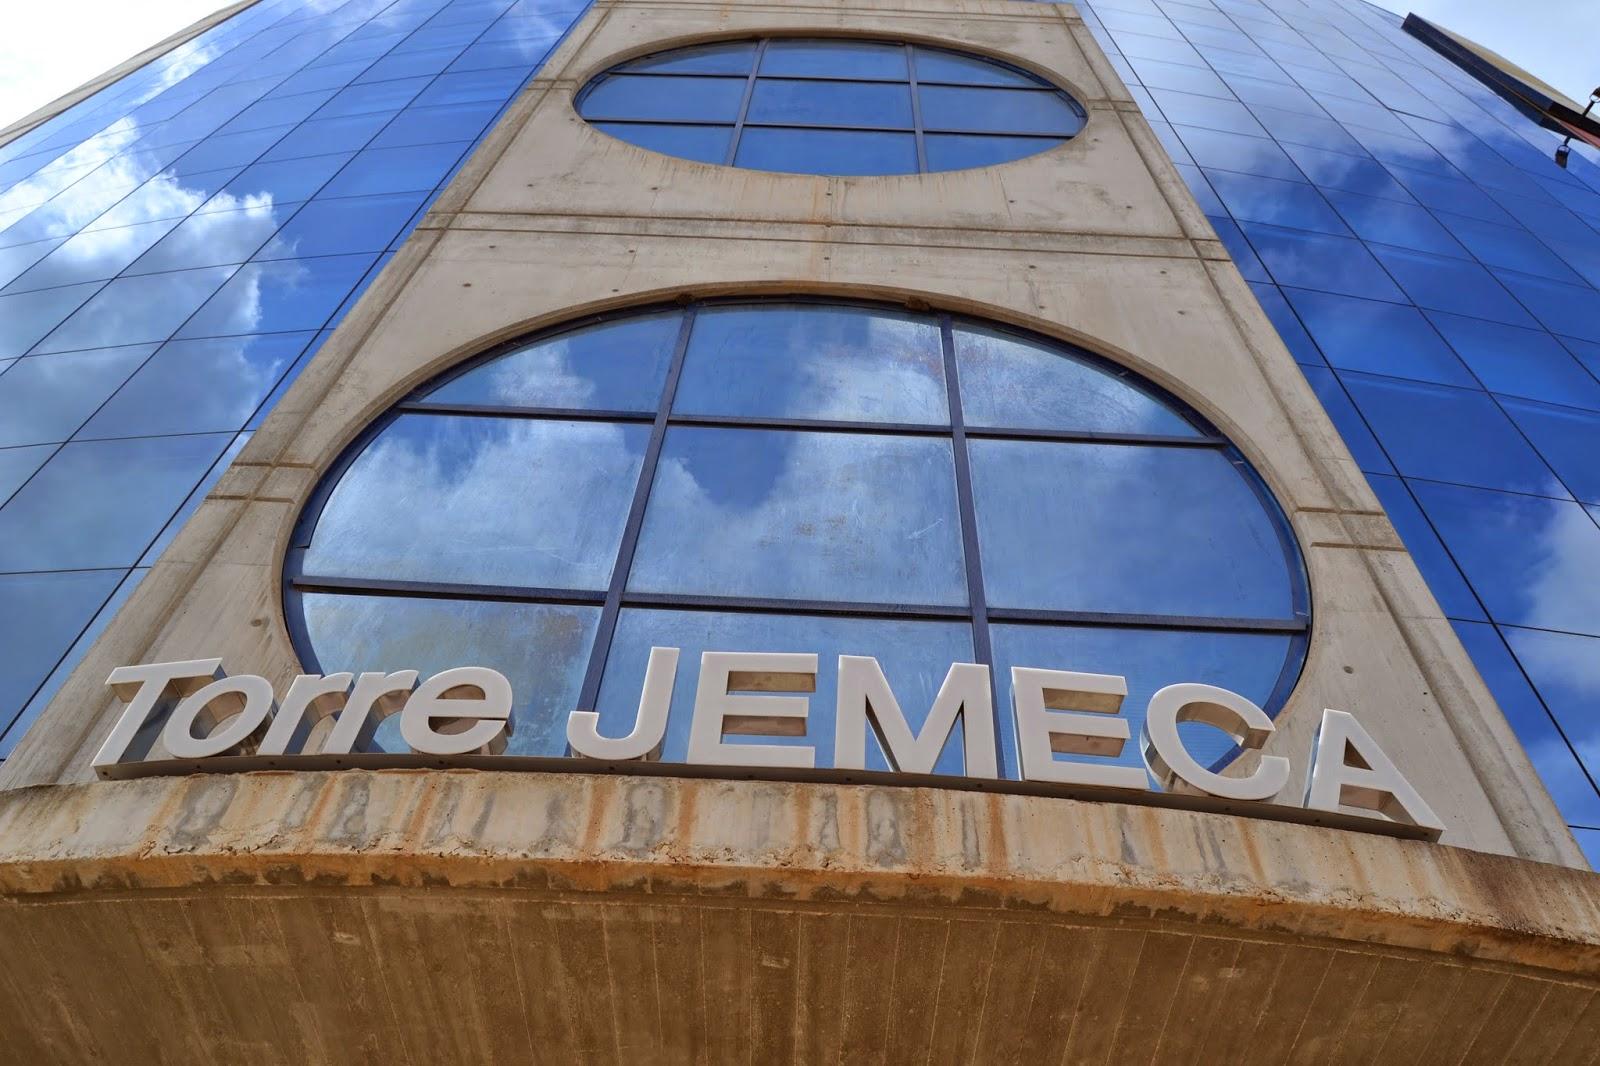 Torre Jemeca